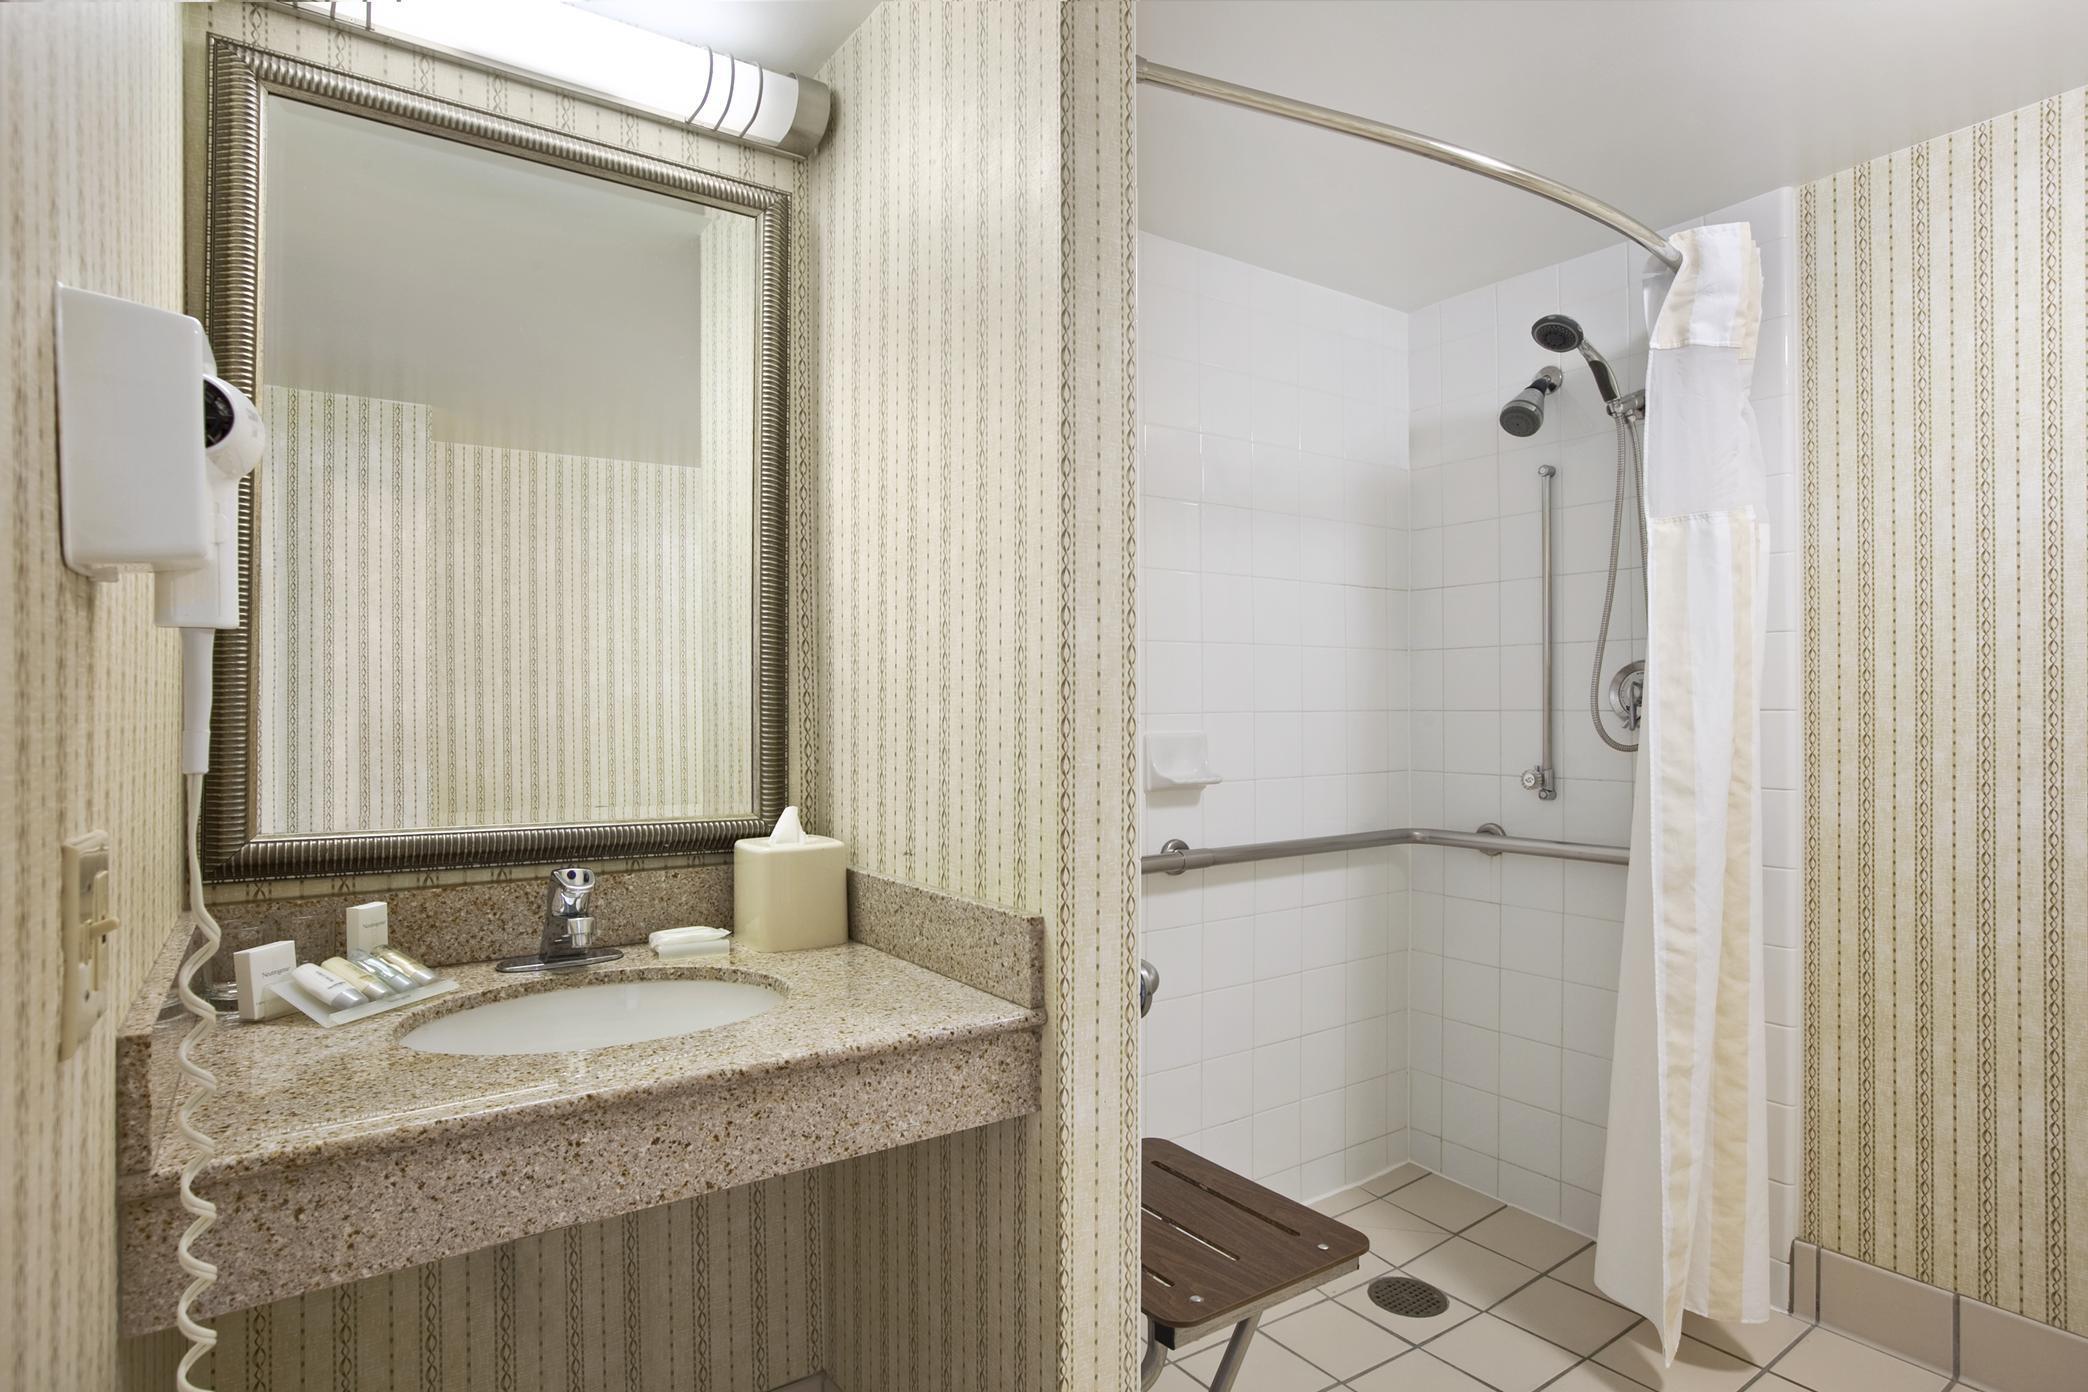 Hilton Garden Inn Chicago/Oakbrook Terrace image 9